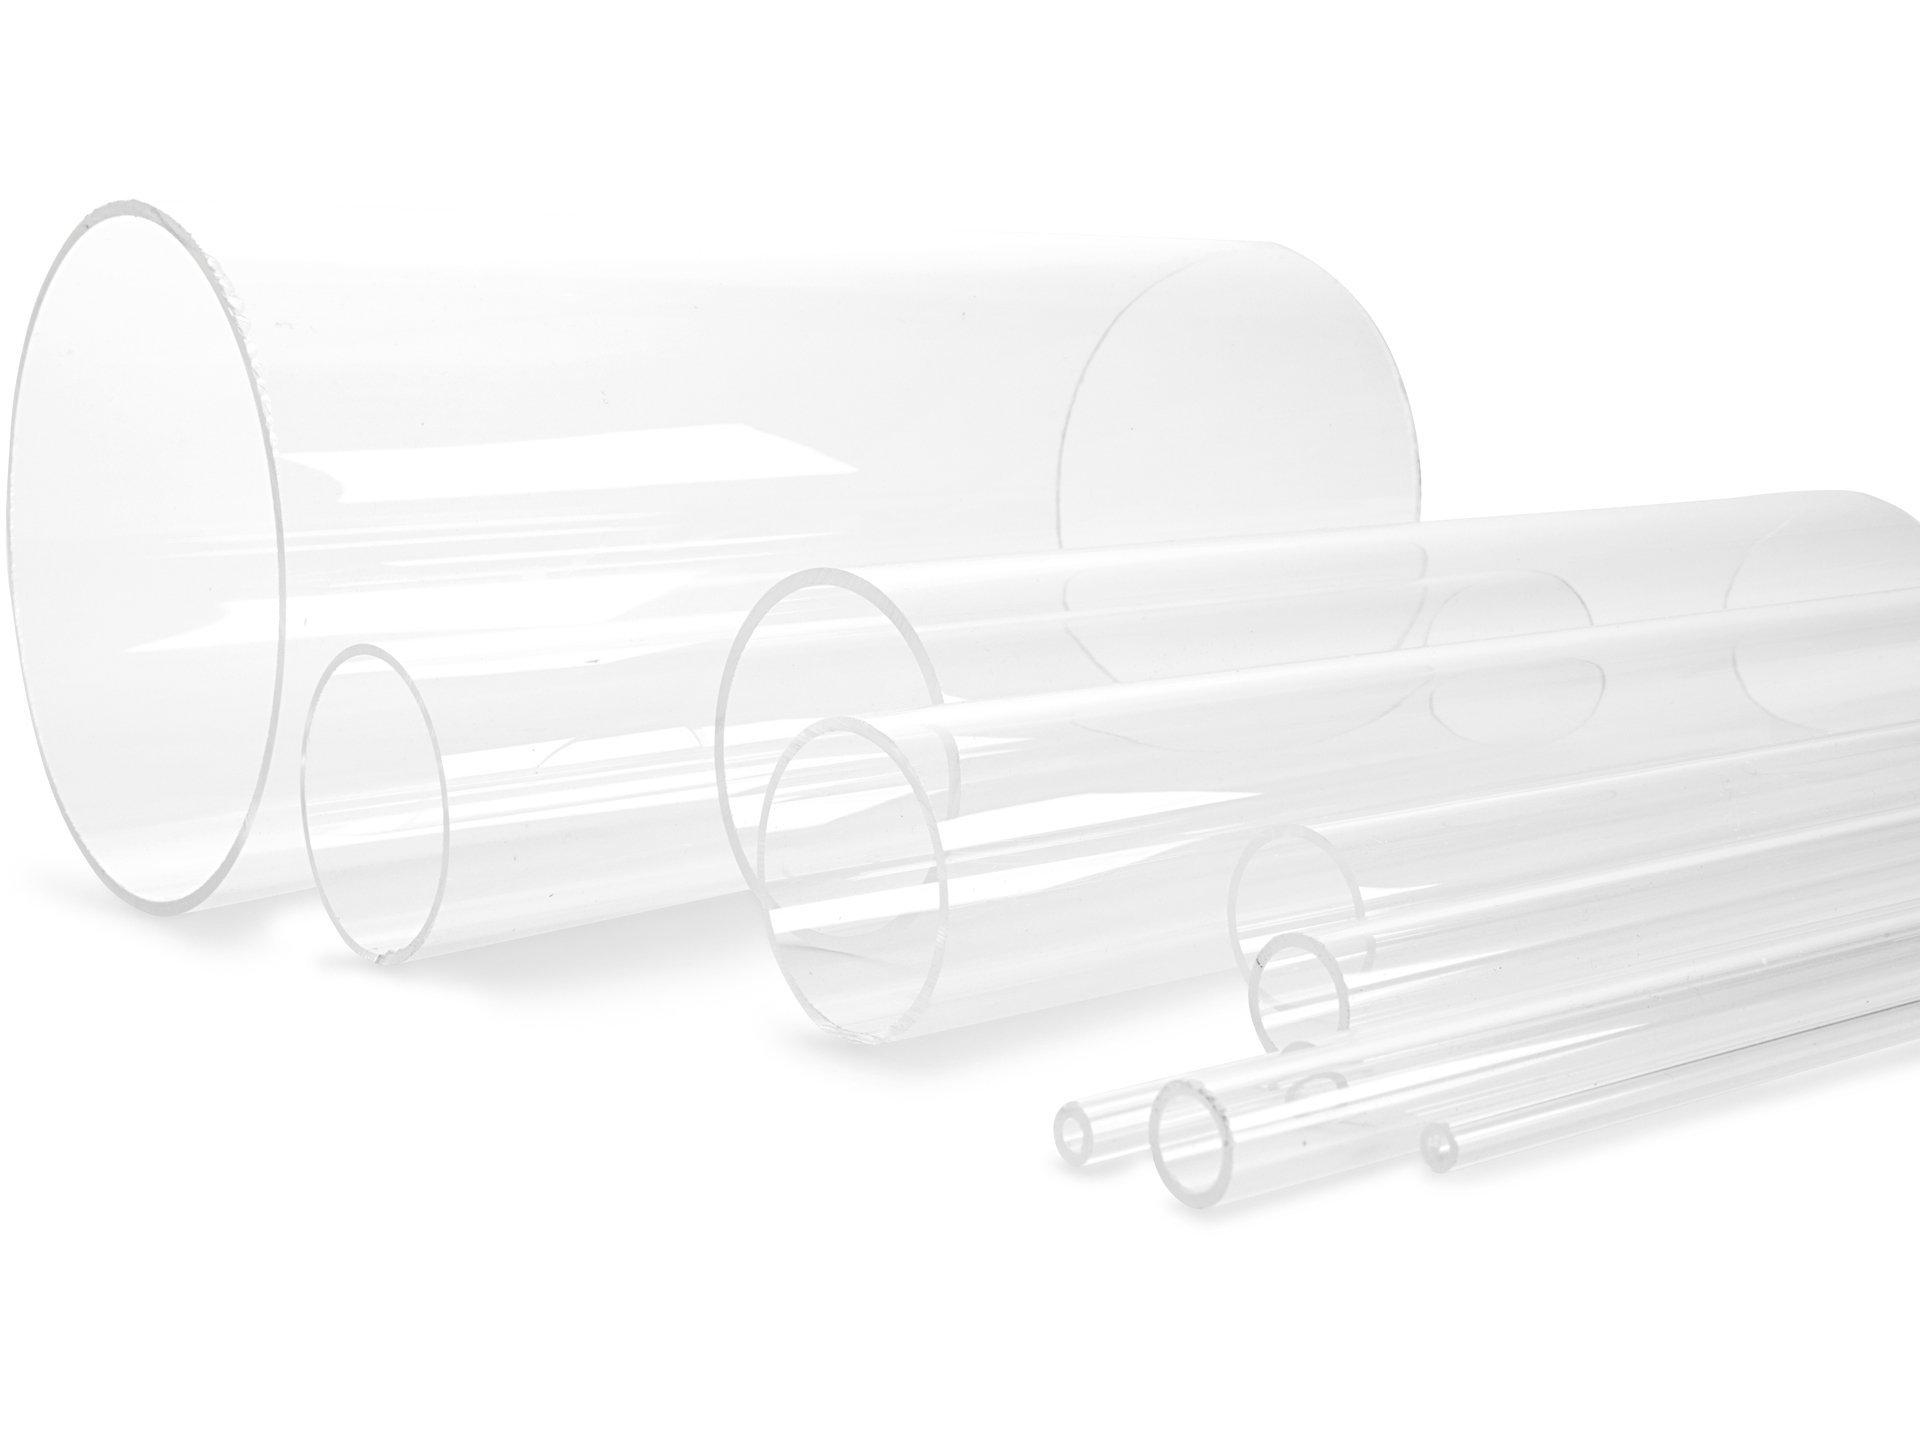 acrylglas xt rundrohr farblos online kaufen modulor. Black Bedroom Furniture Sets. Home Design Ideas